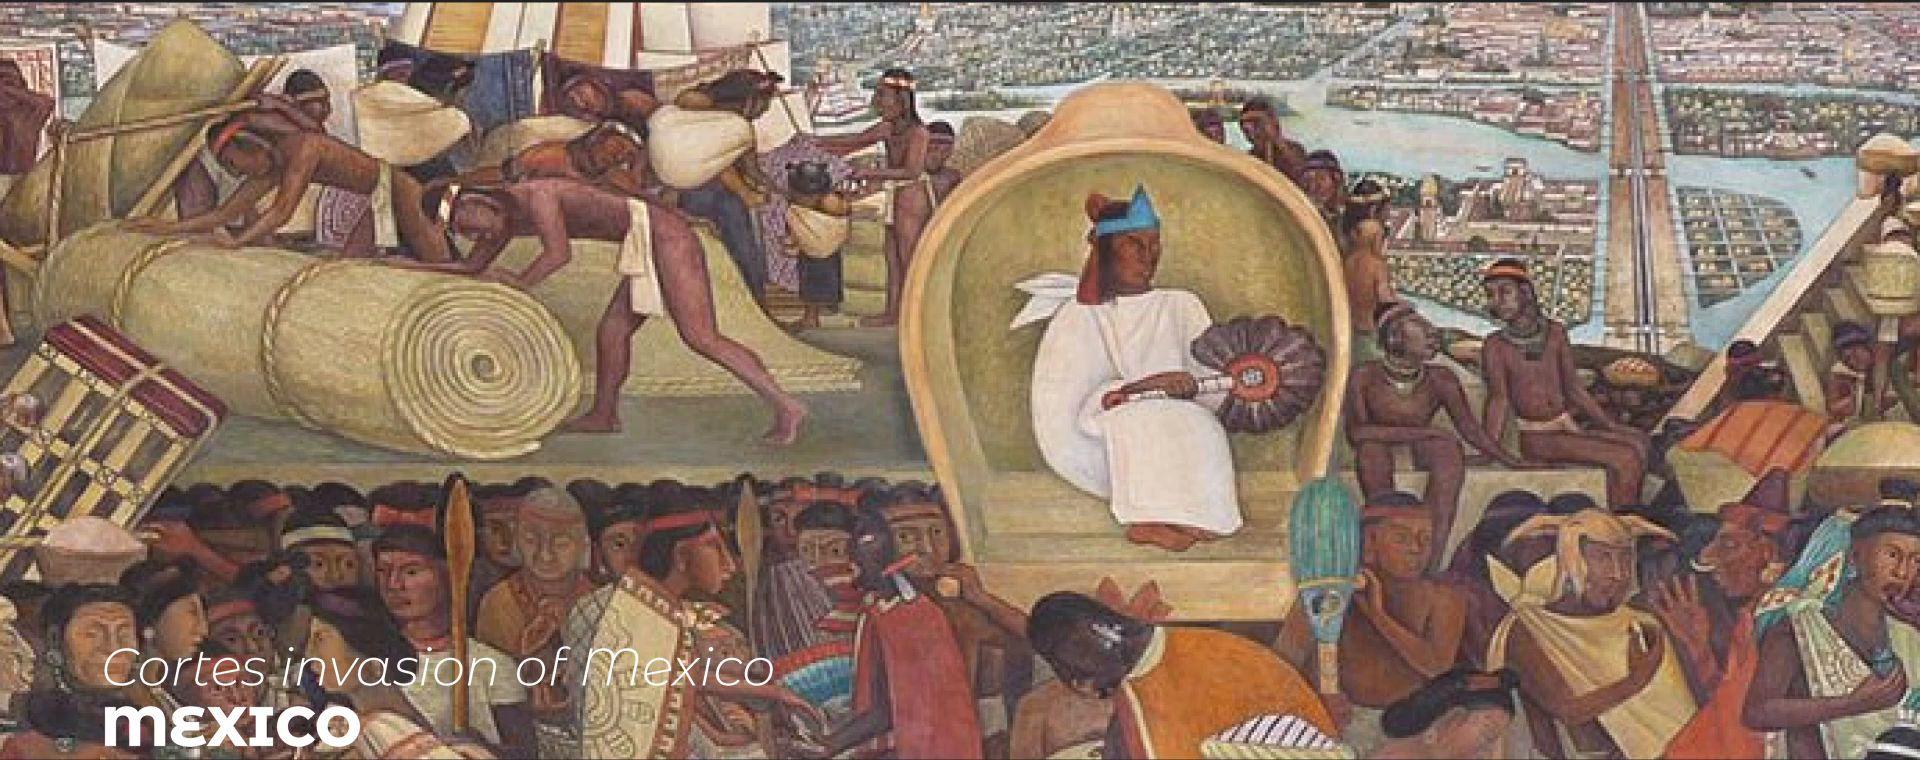 CORTES INVASION OF MEXICO